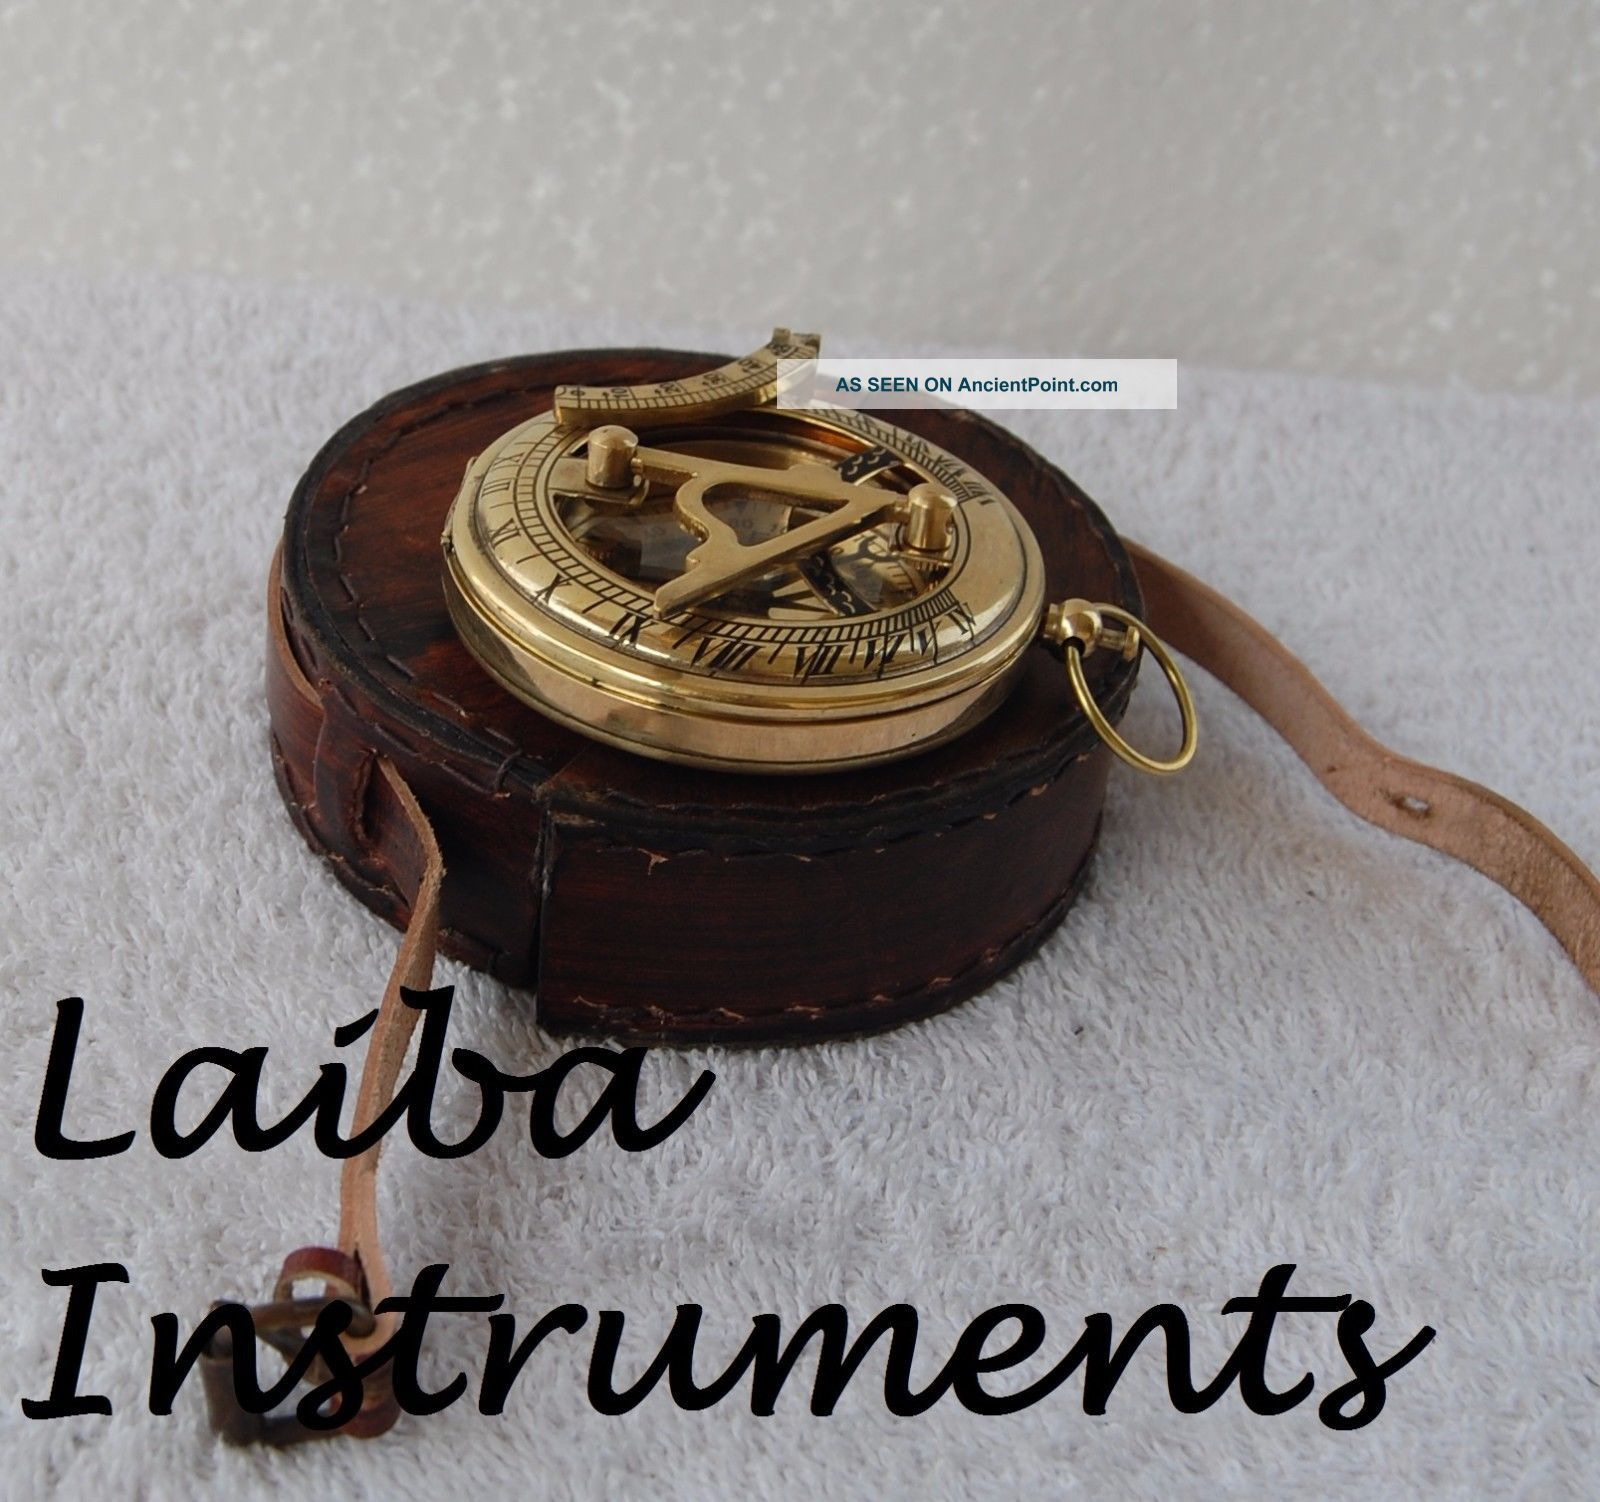 Nautical Handmade Antique Vintage Brass Gift Pocket Push Button Sundial Compass Compasses photo